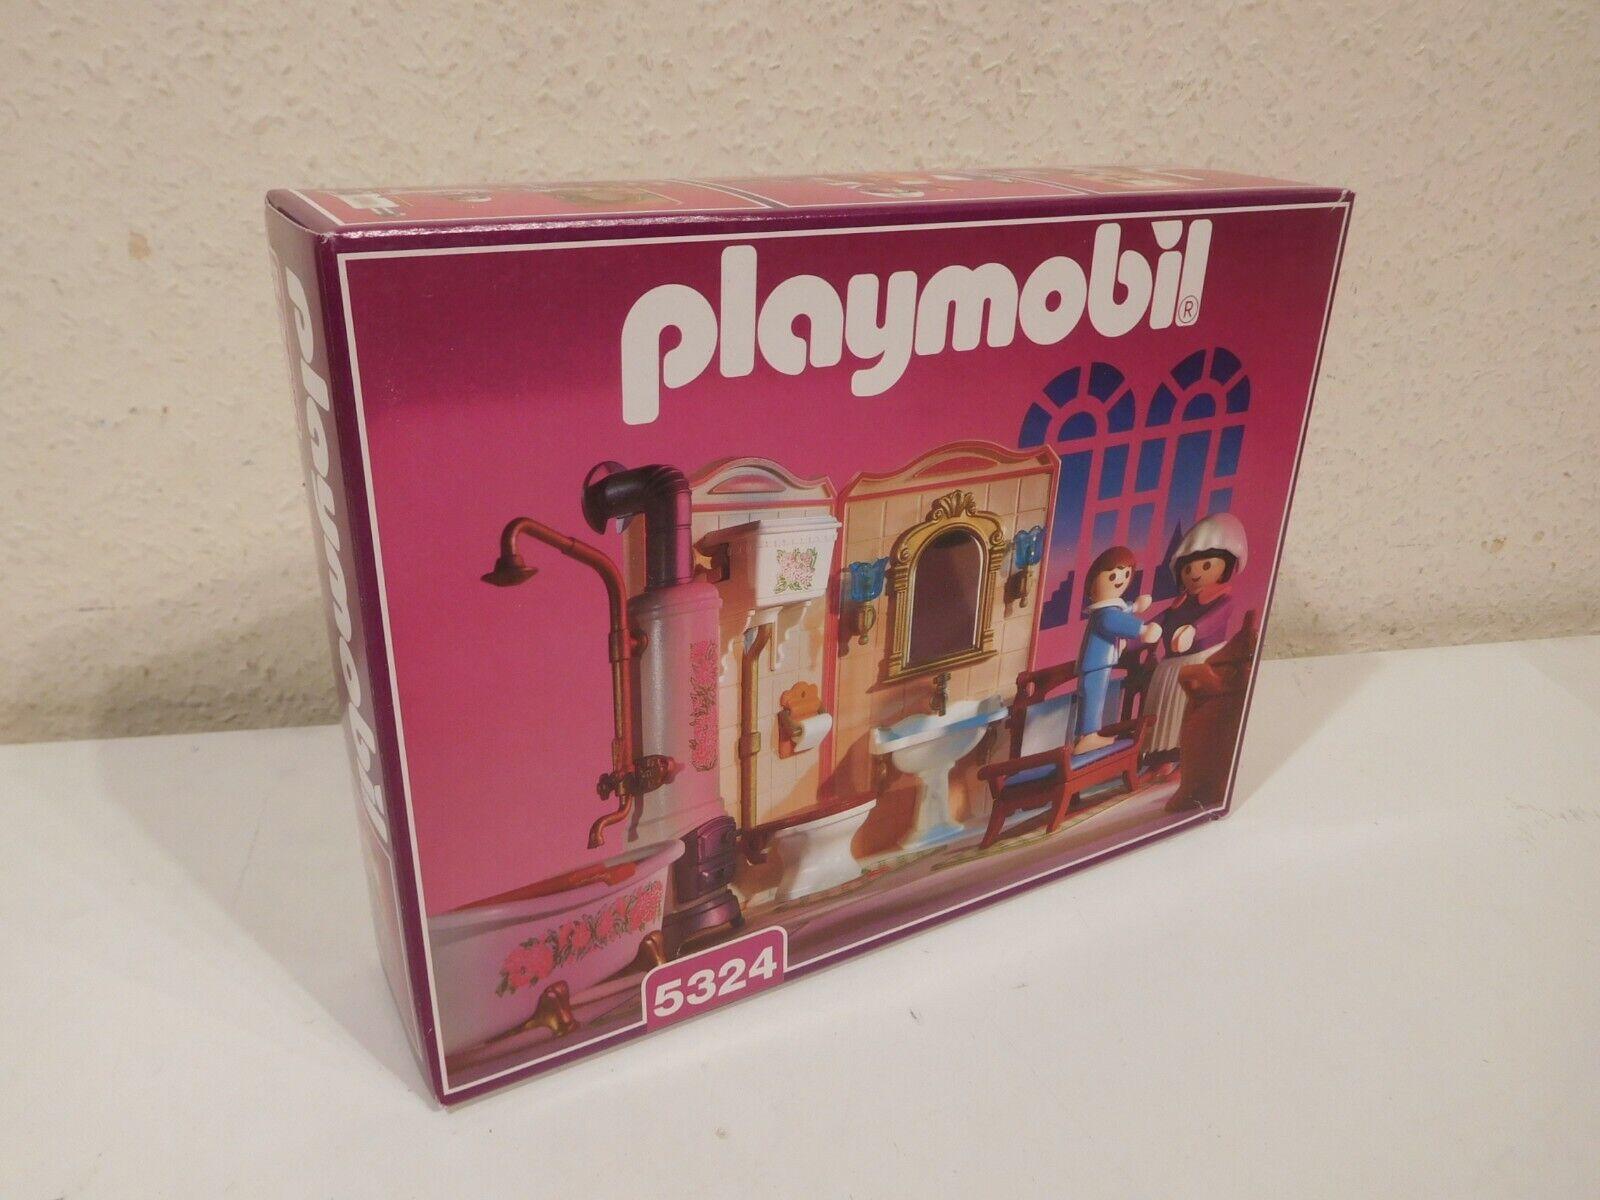 Playmobil 5324 5324 5324 5300 dollhouse bathroom badezimmer puppenhaus ovp neu MISB 149196